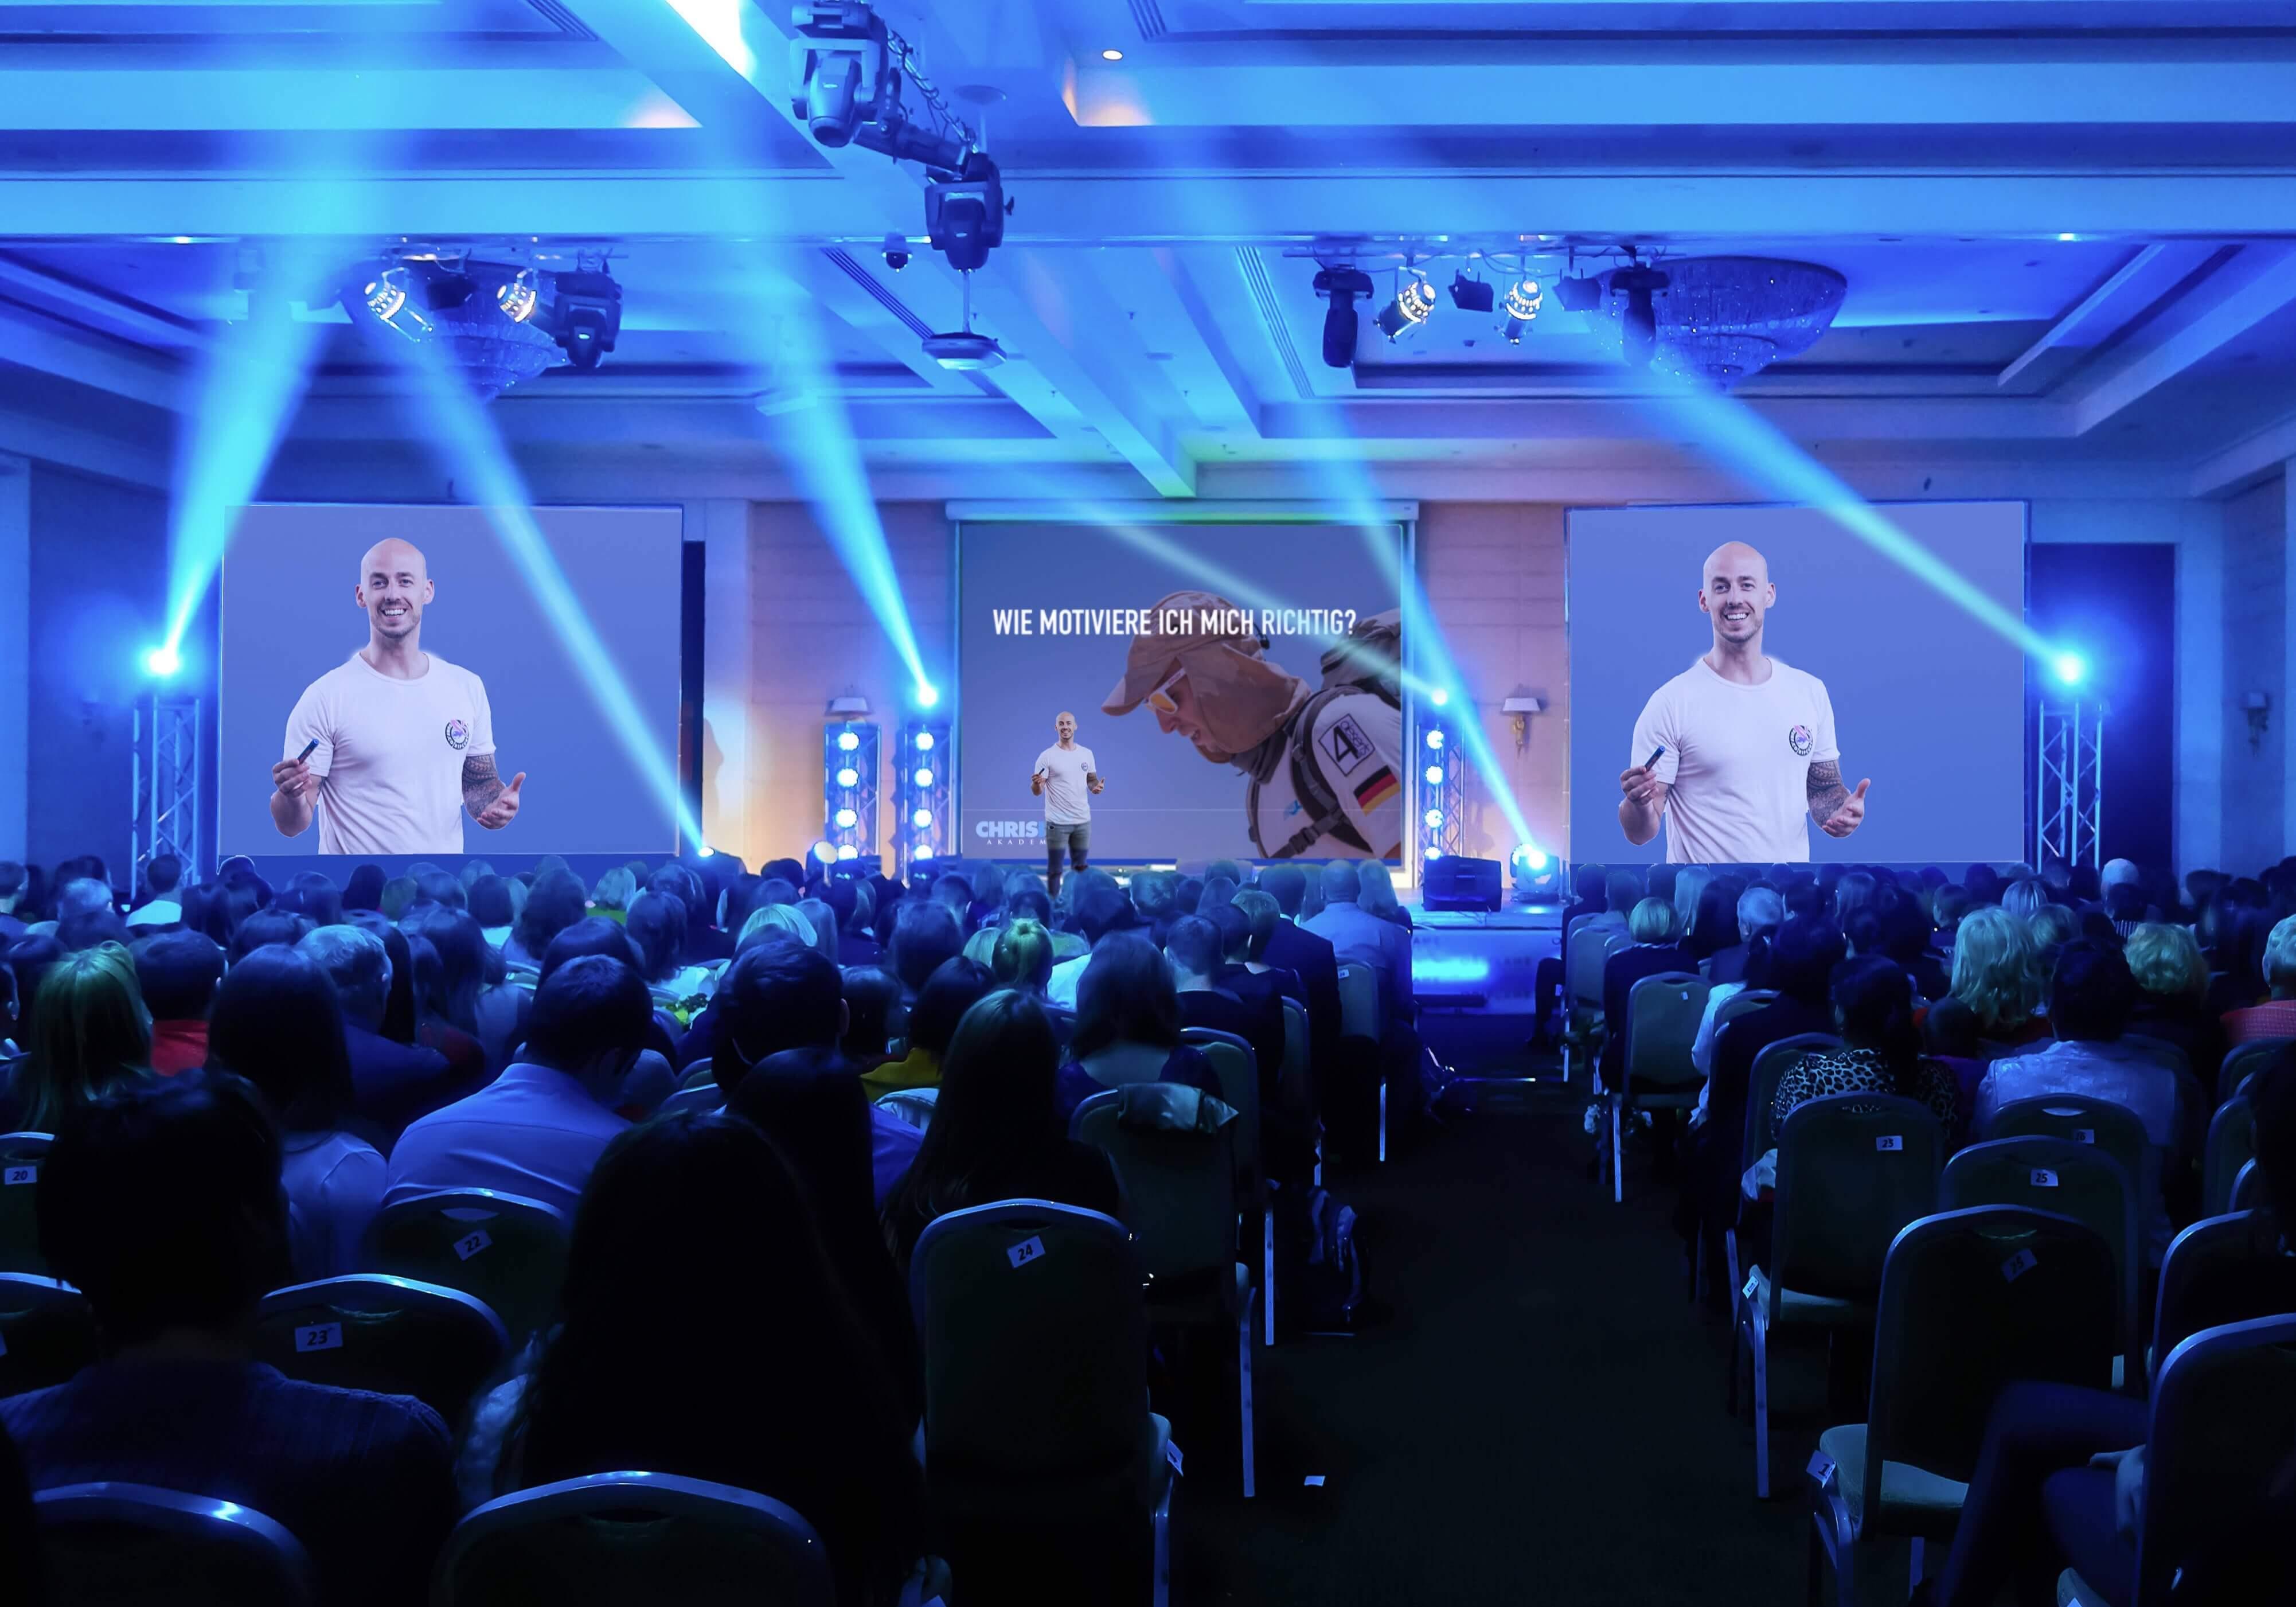 Chris Ley Motivationstrainer & Keynote Speaker